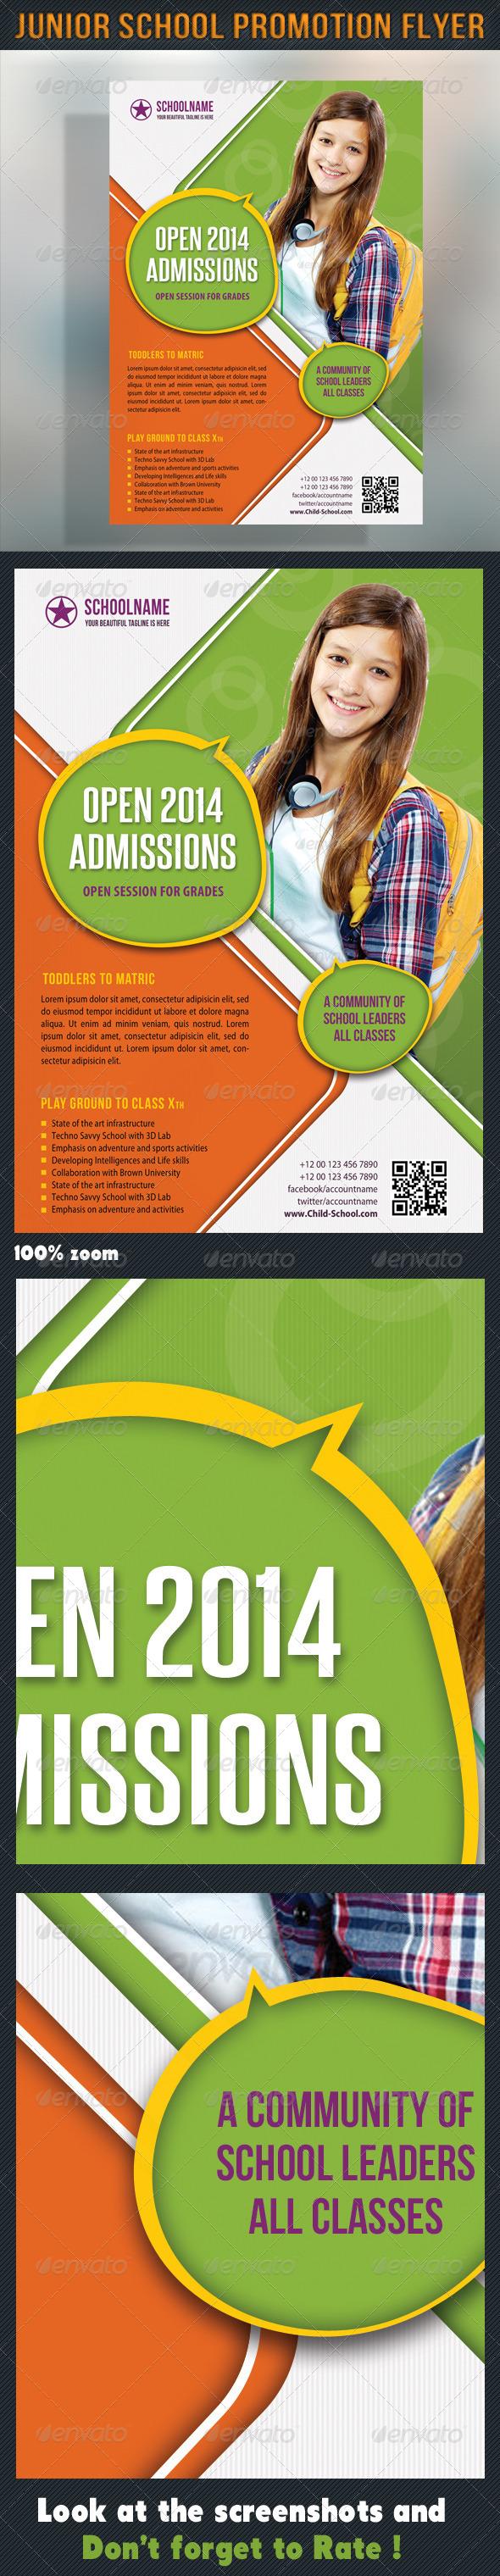 Junior School Promotion Flyer 04 - Events Flyers